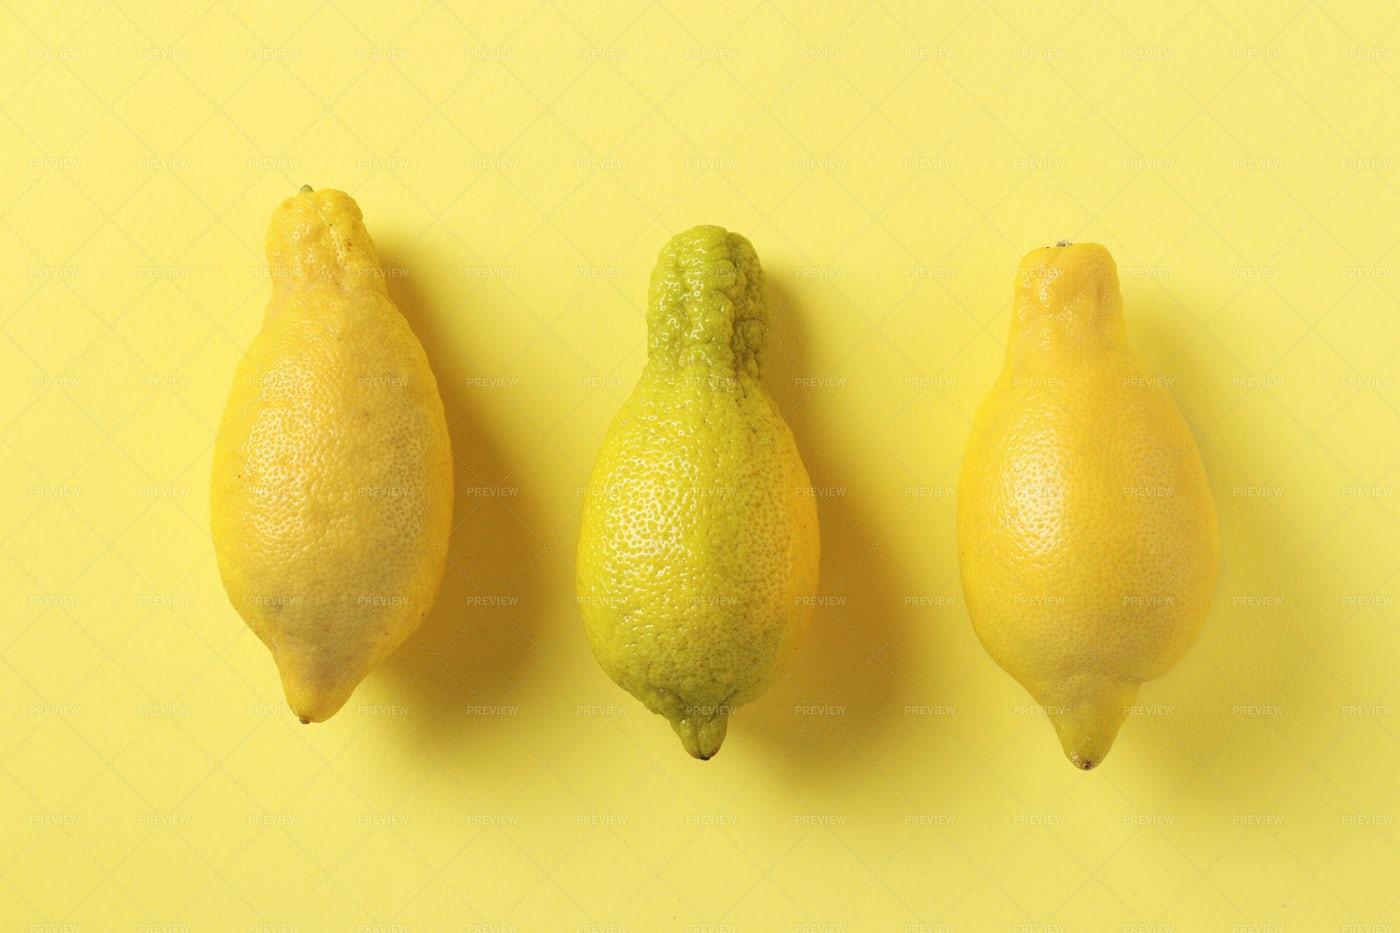 Three Ugly Lemons: Stock Photos